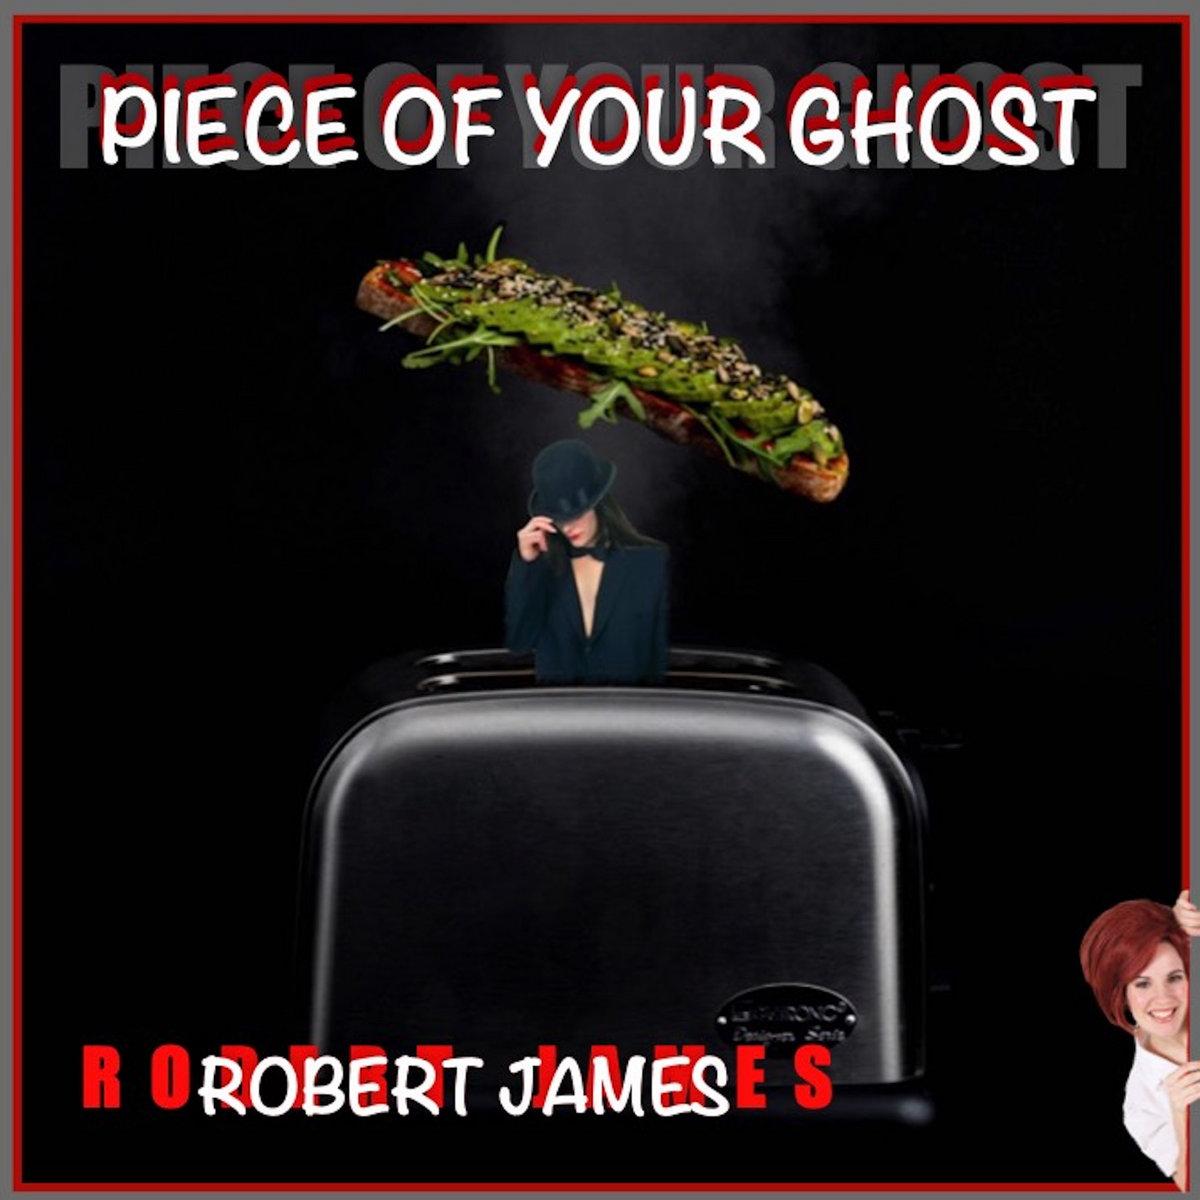 Album cover artwork for Robert James's latest release